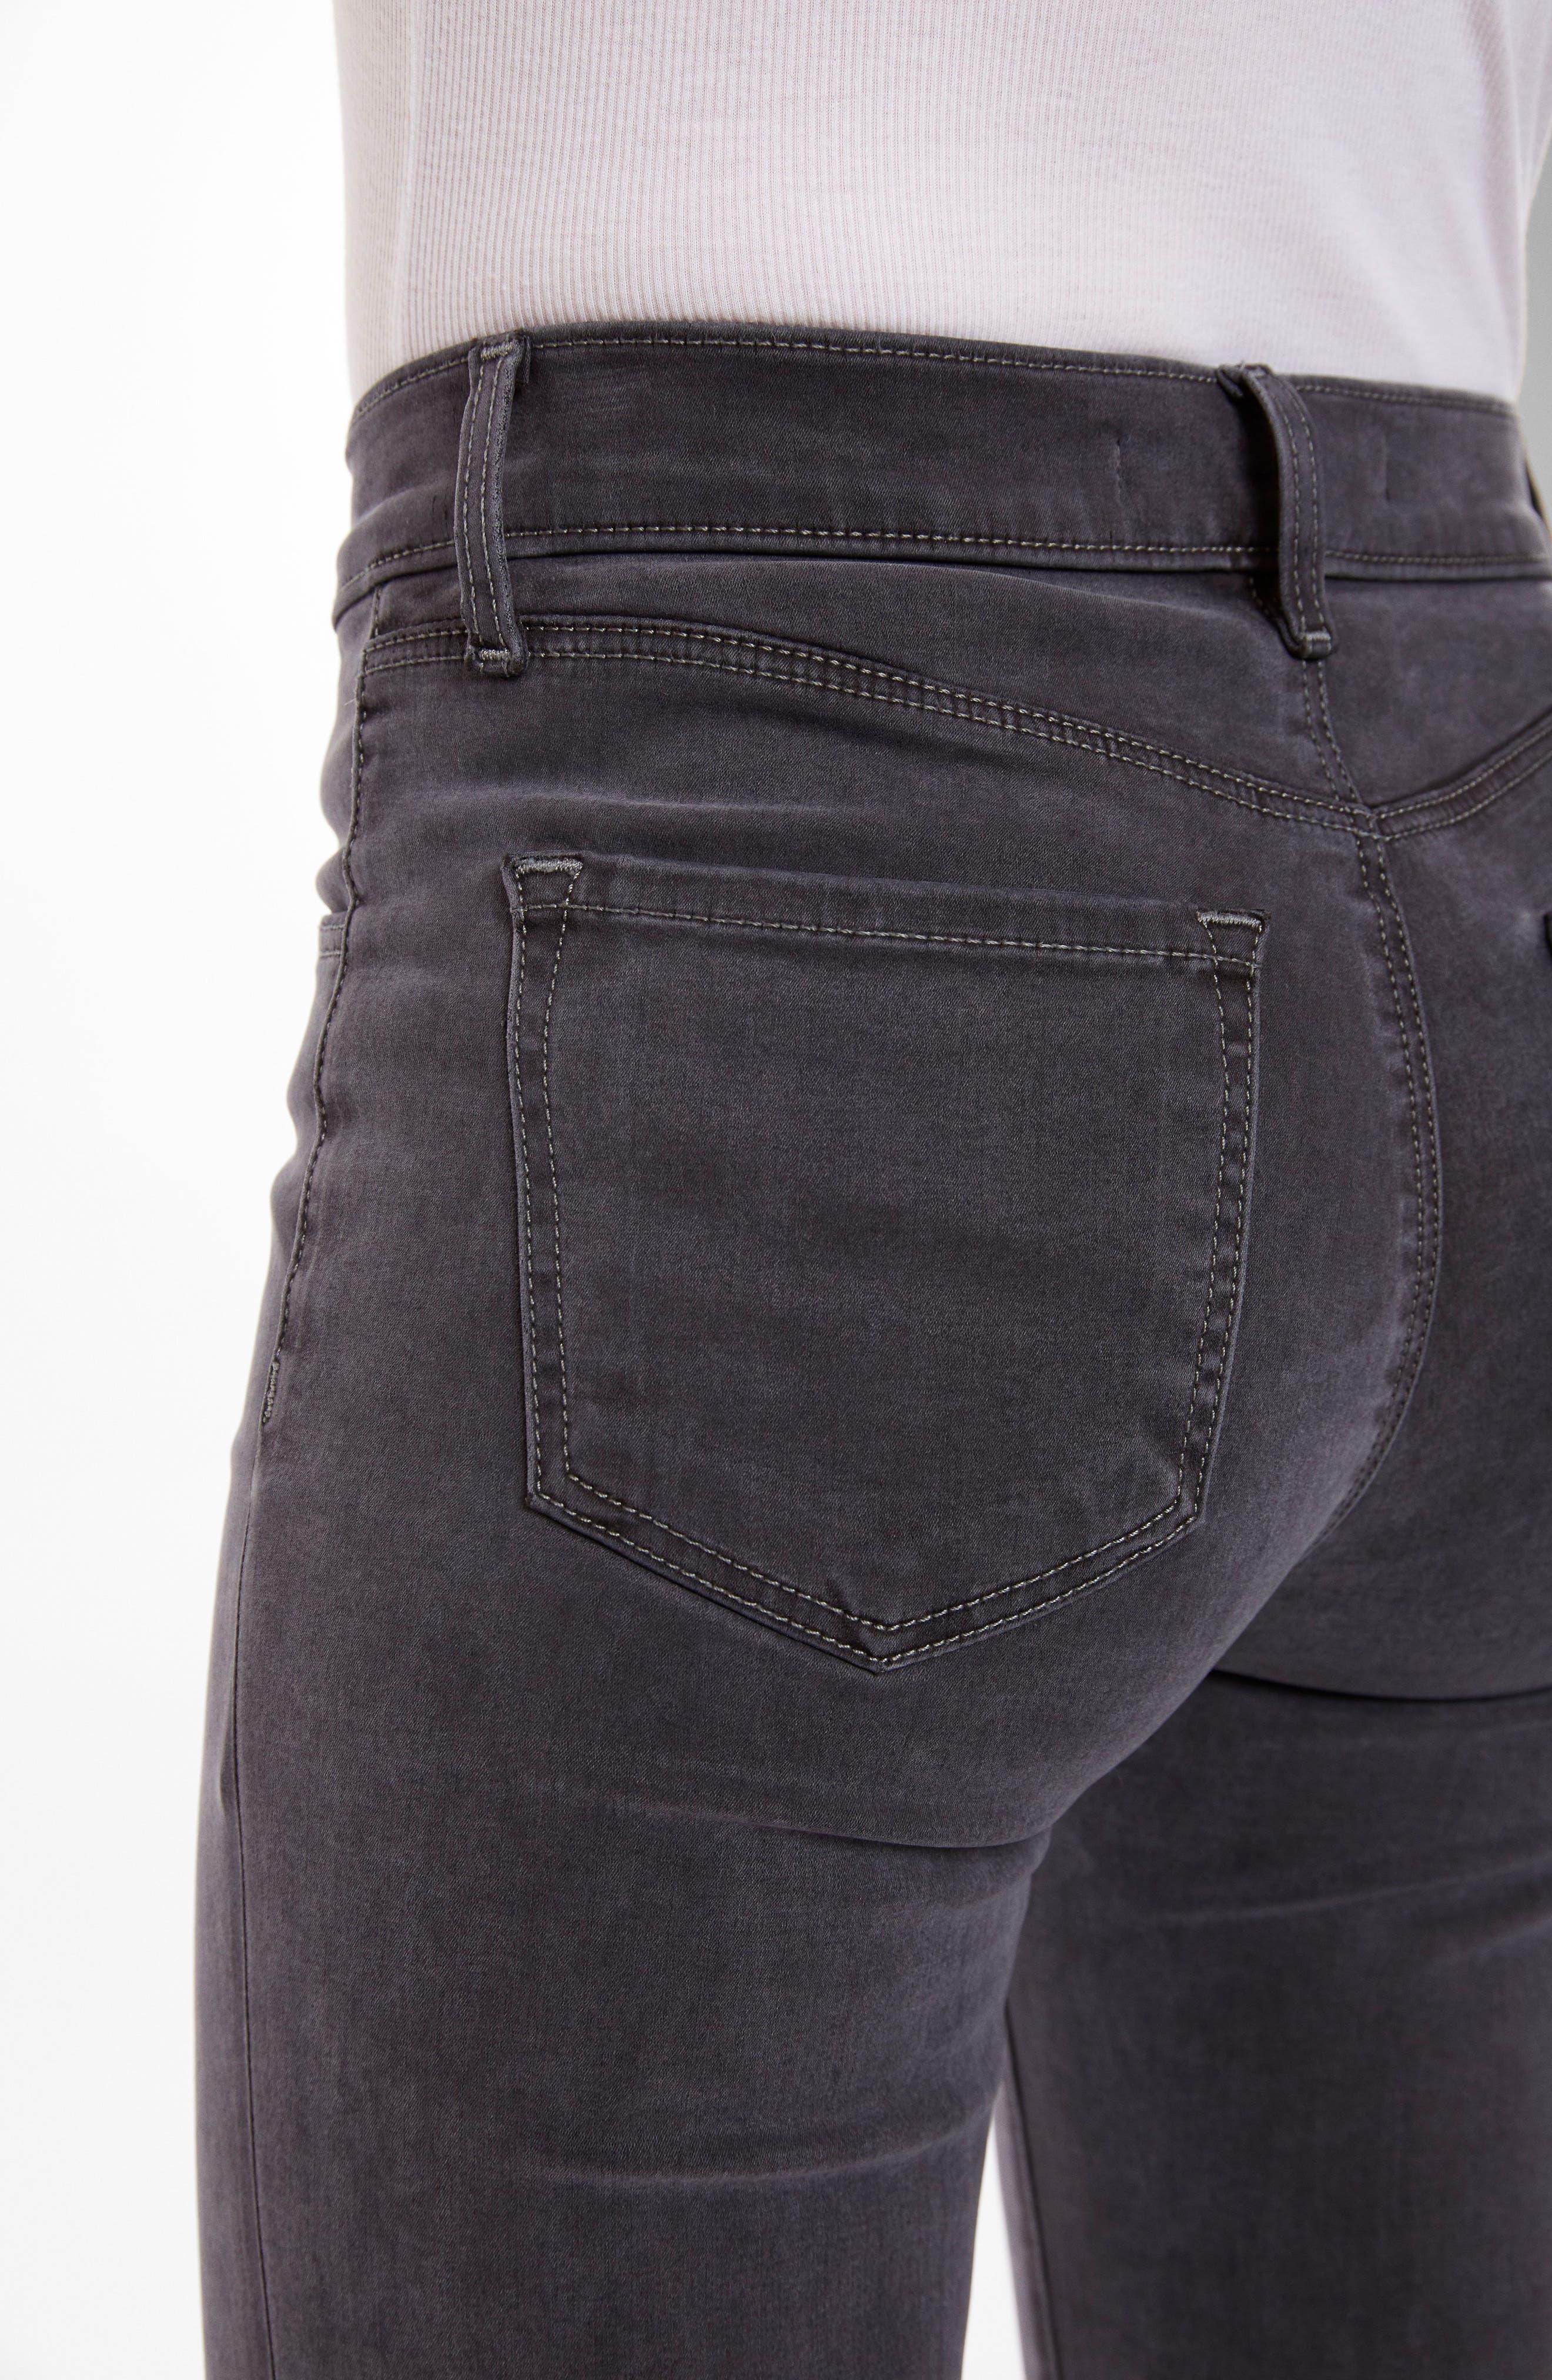 Alana High Waist Crop Skinny Jeans,                             Alternate thumbnail 5, color,                             010